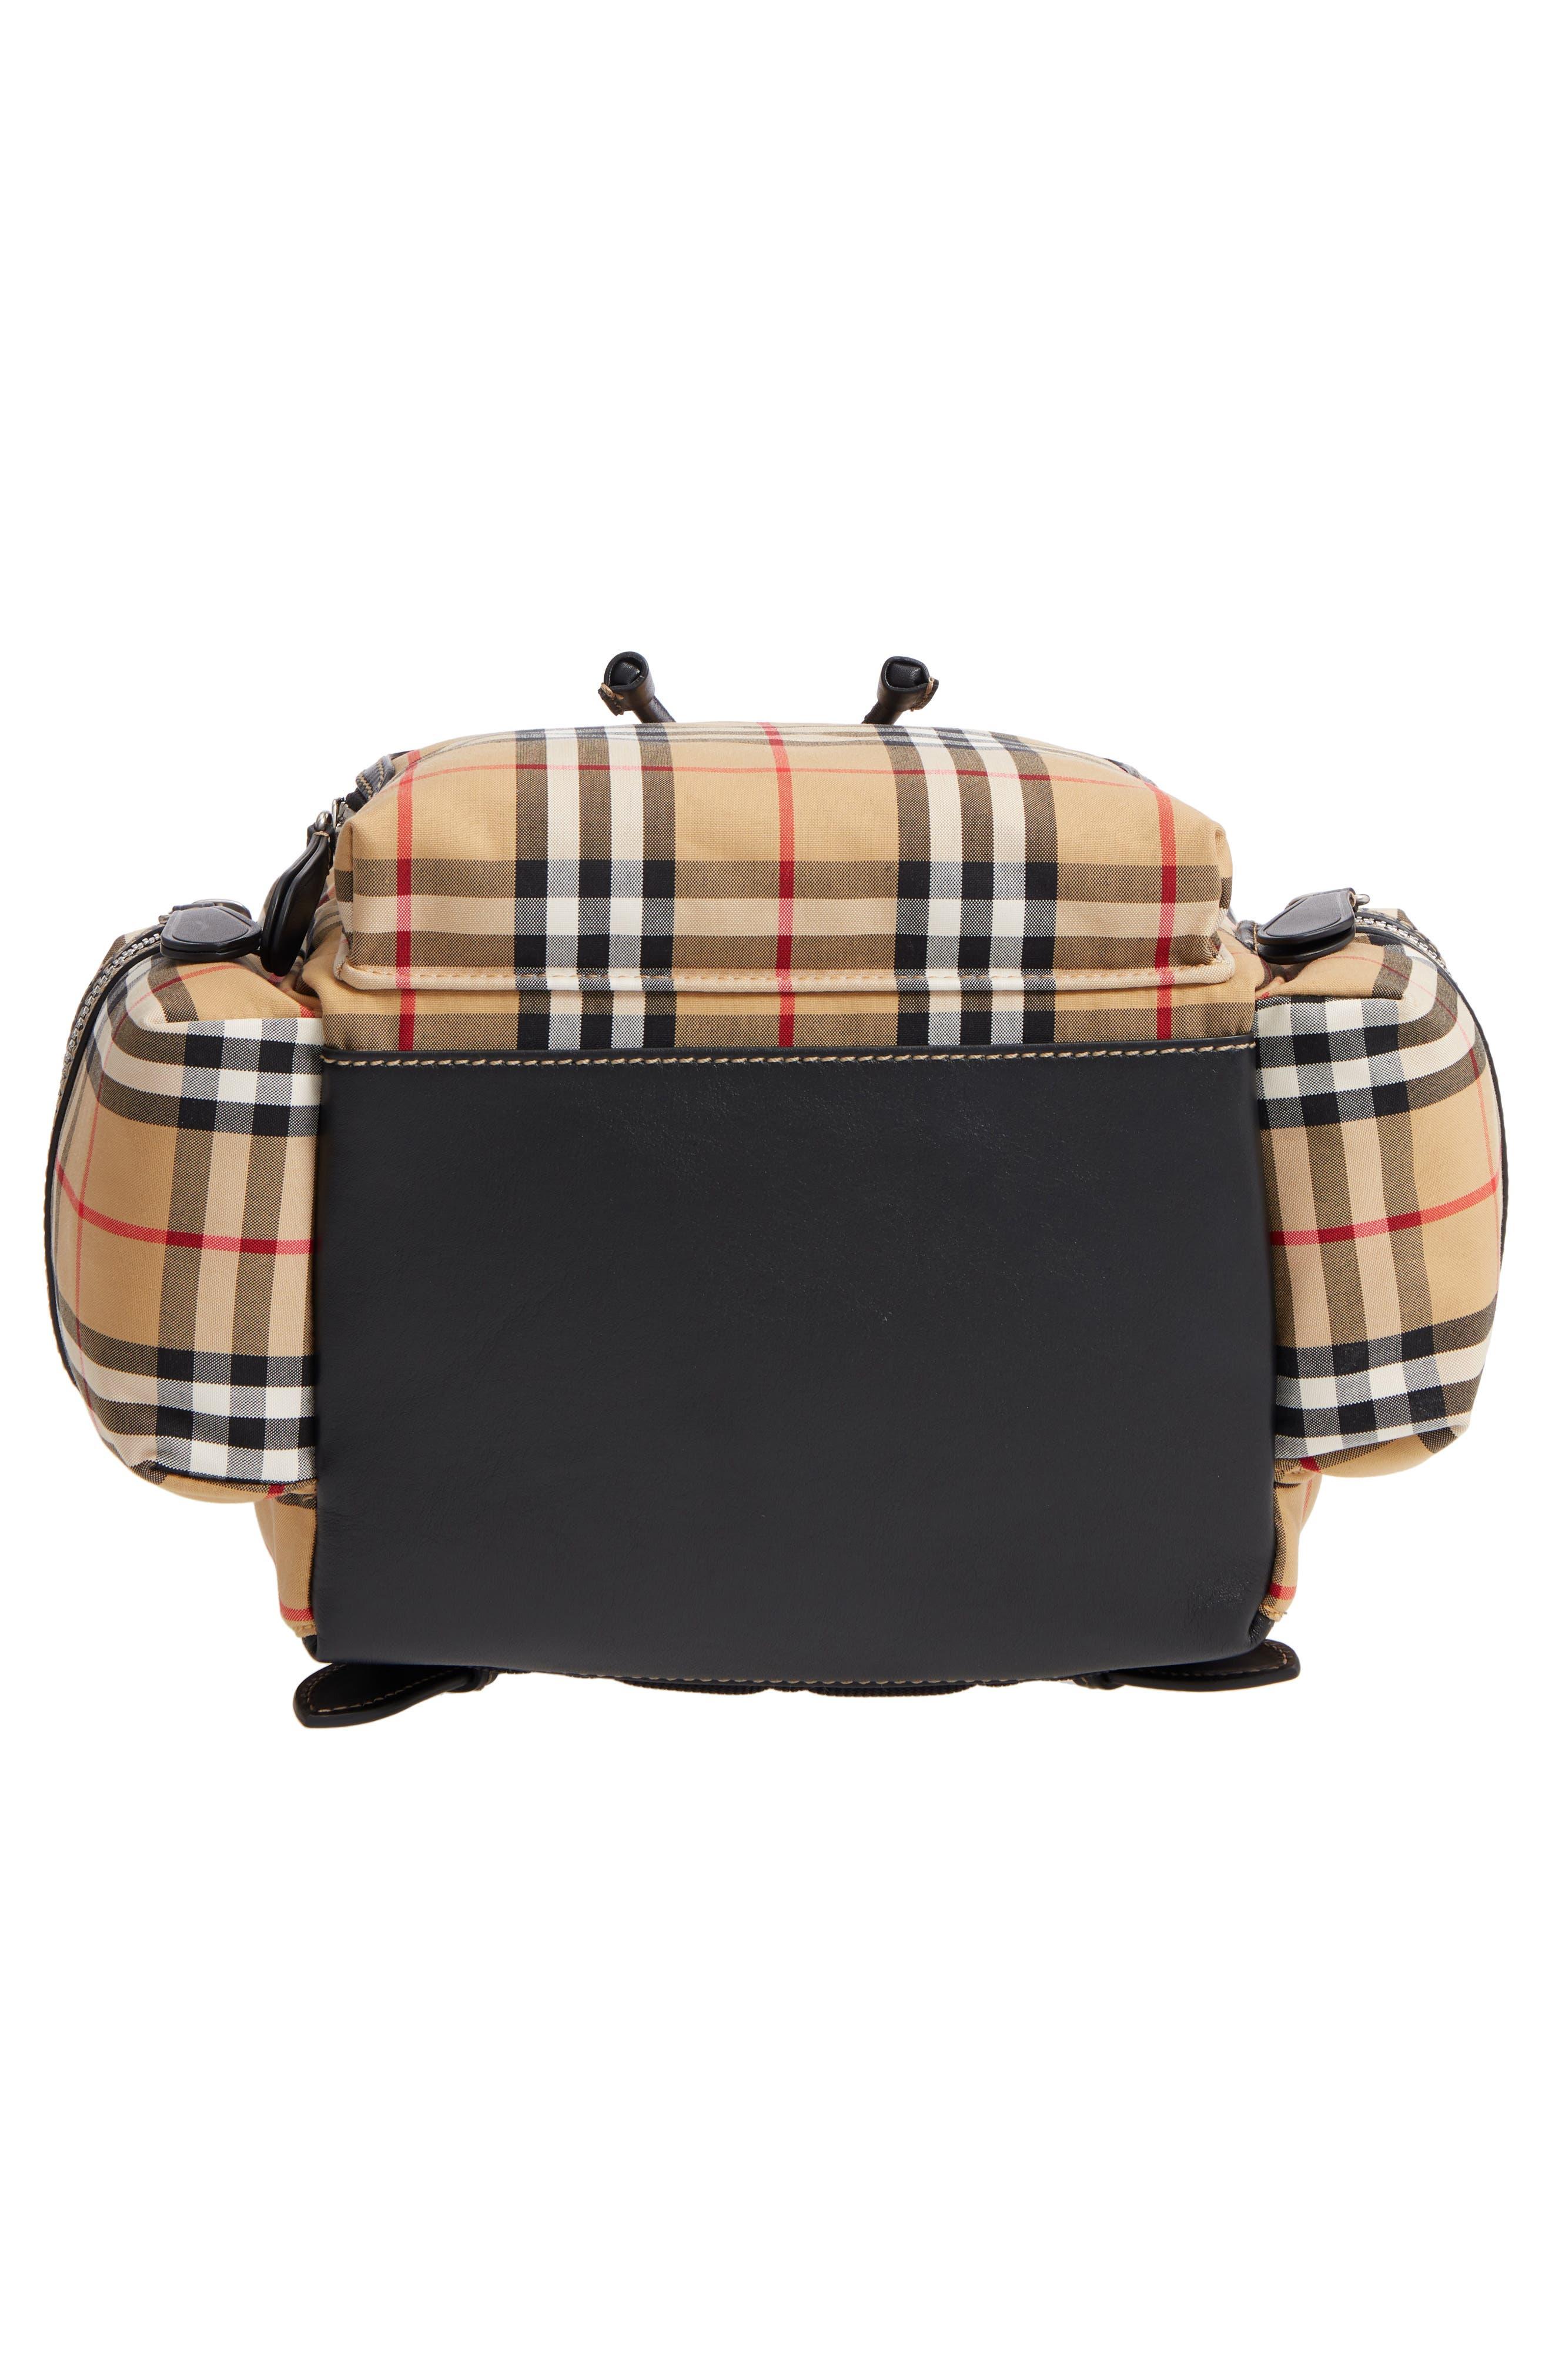 Medium Rucksack Check Cotton Backpack,                             Alternate thumbnail 6, color,                             ANTIQUE YELLOW